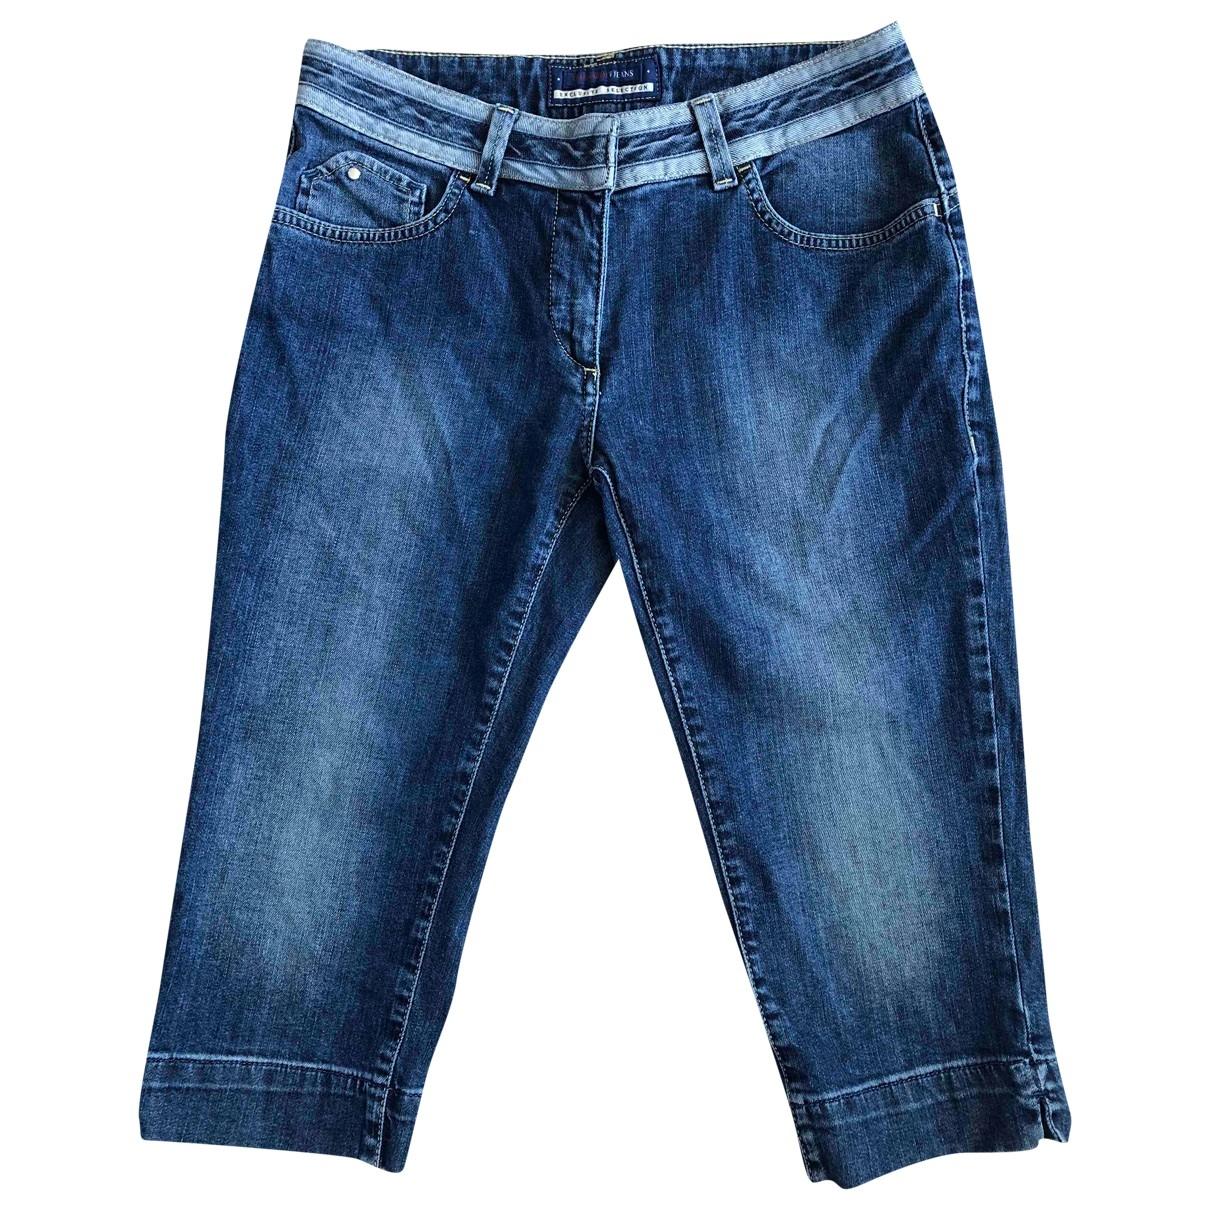 Trussardi Jeans \N Shorts in  Blau Baumwolle